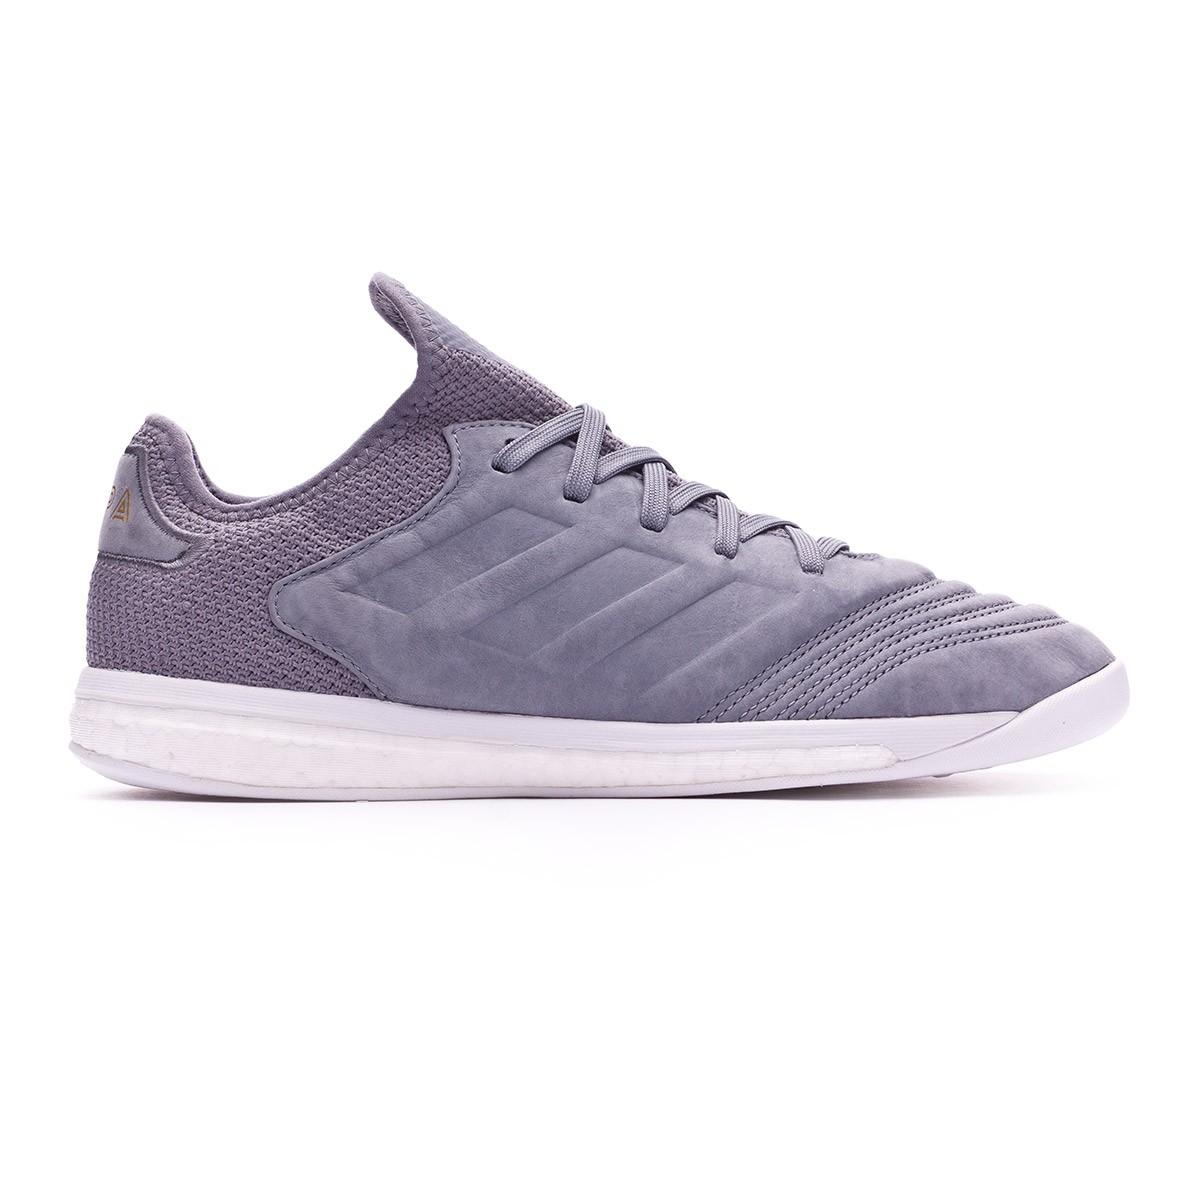 hot sale online 48c09 27a4e Trainers adidas Copa 18+ TR Premium Grey-Gold metallic - Football store  Fútbol Emotion